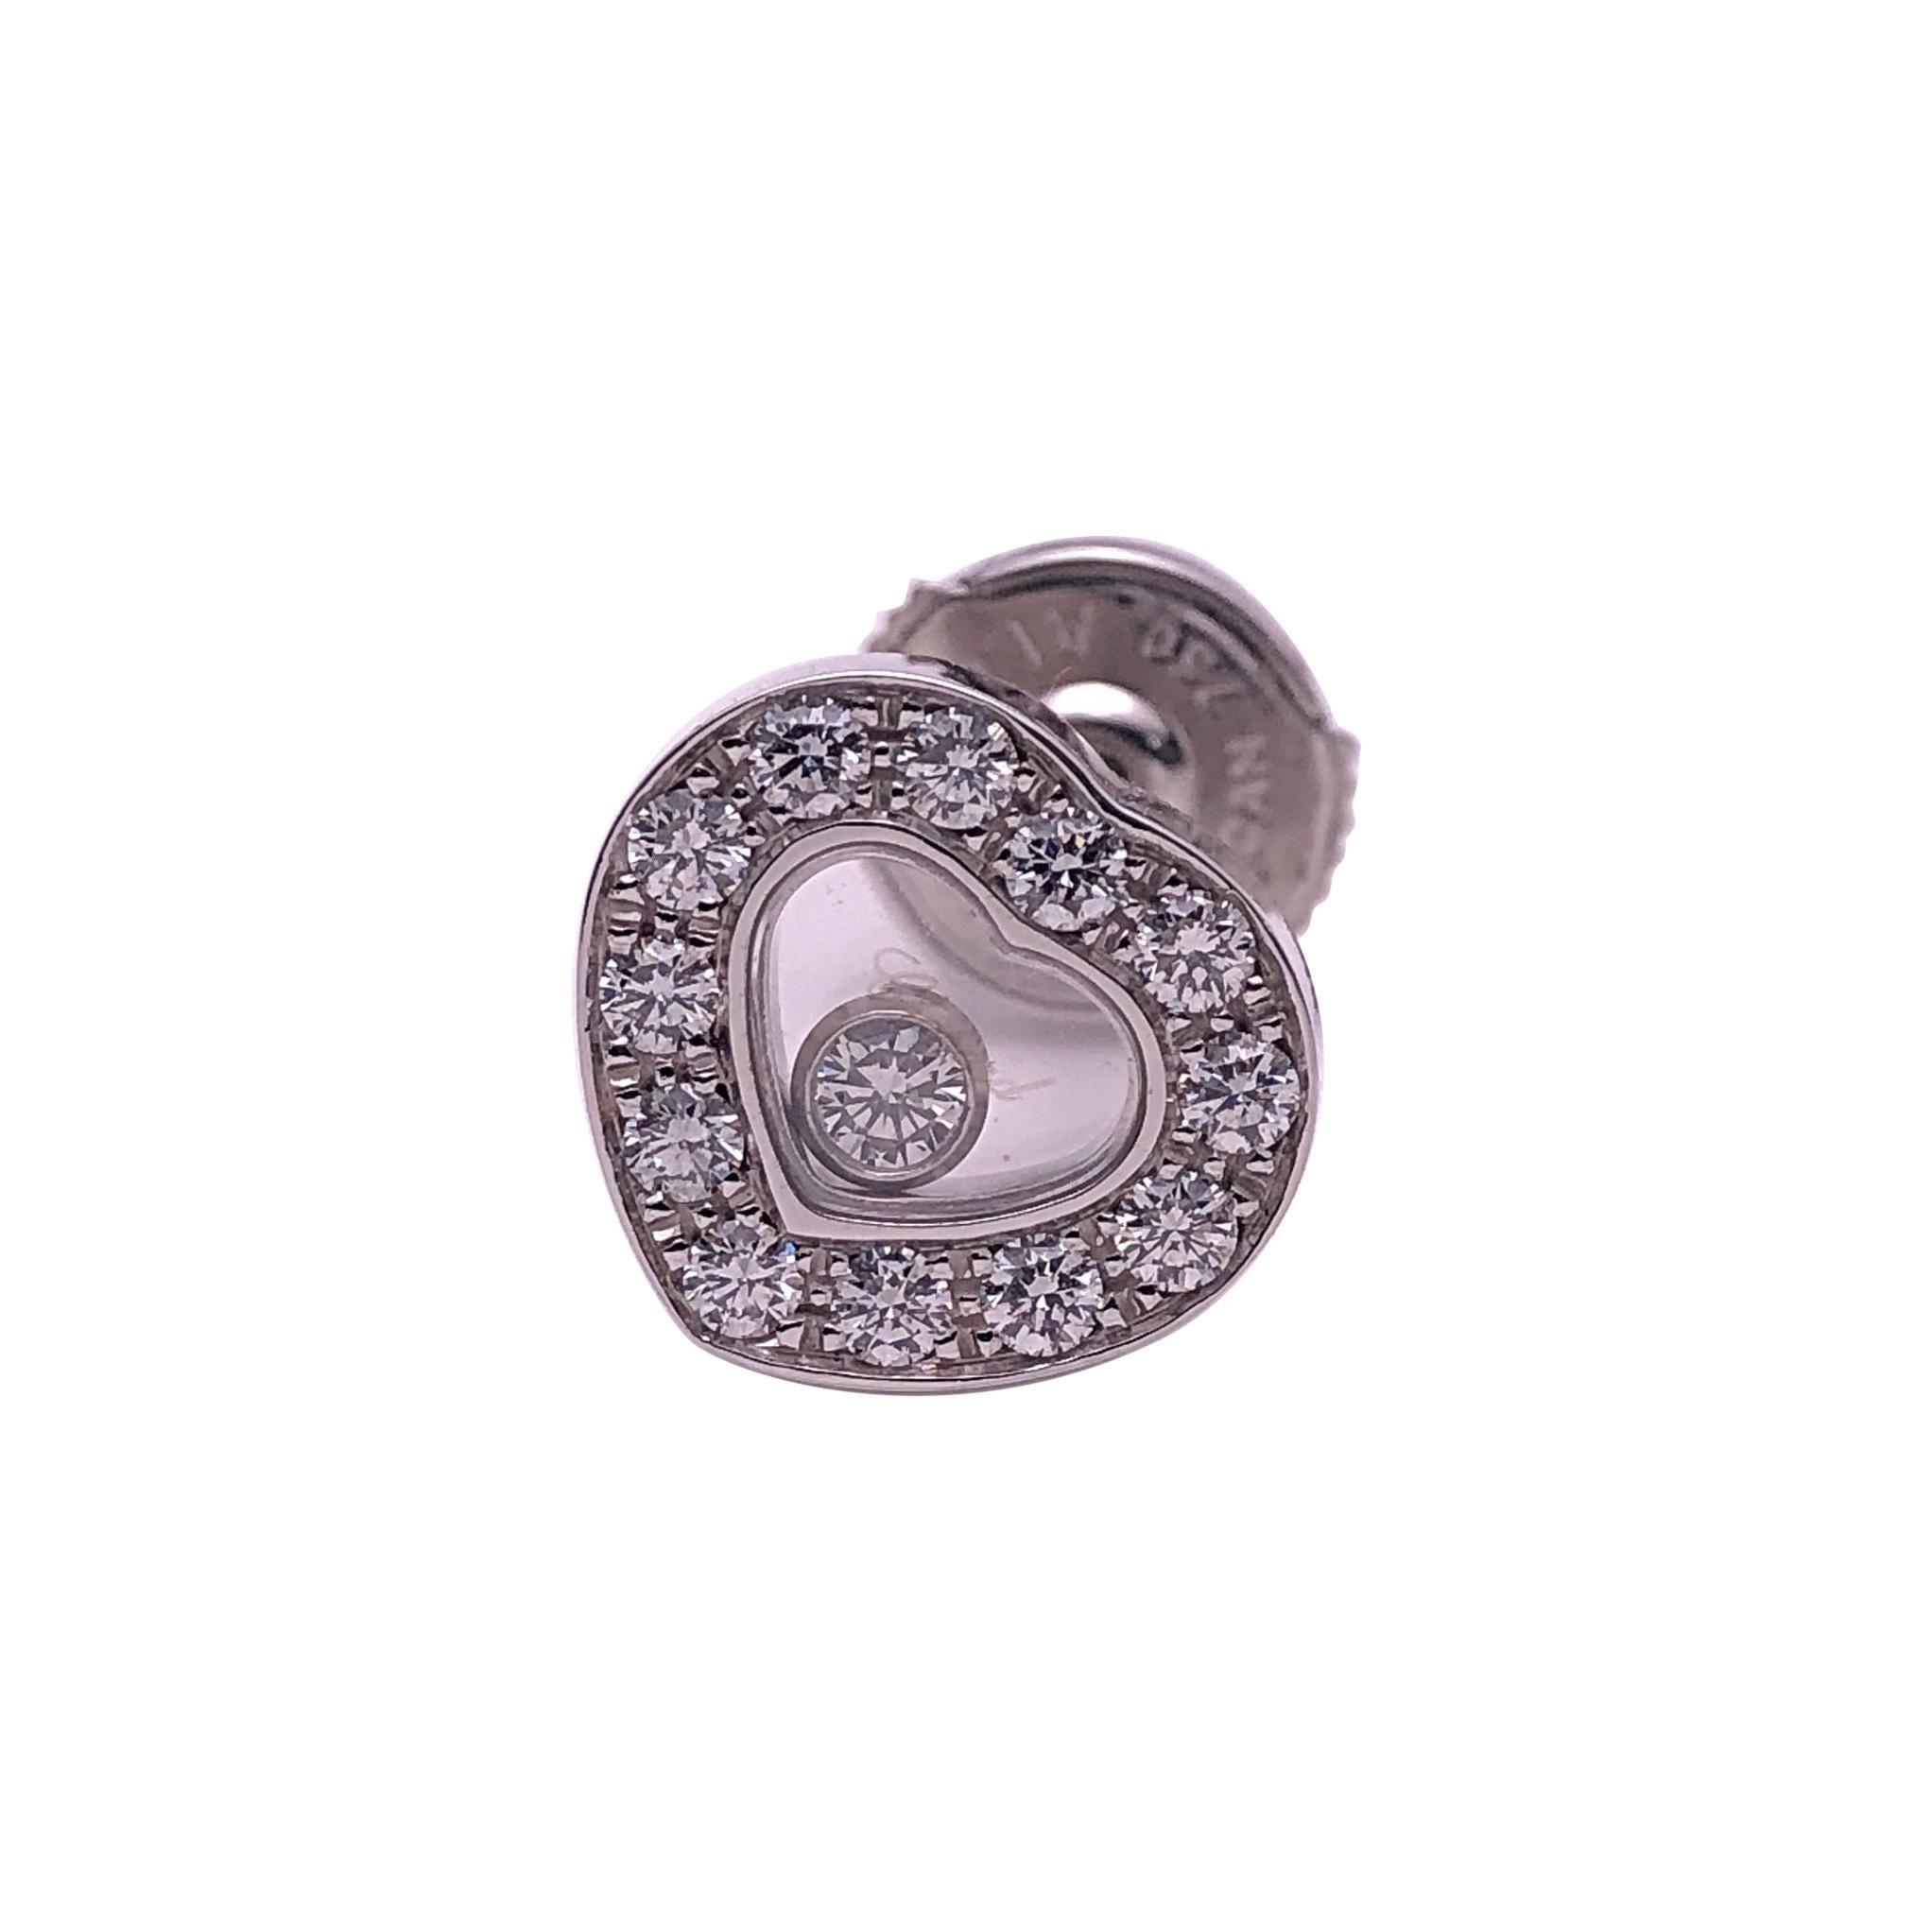 Chopard 18 Karat Gold Diamond Heart Stud Earrings with Single Floating Diamond